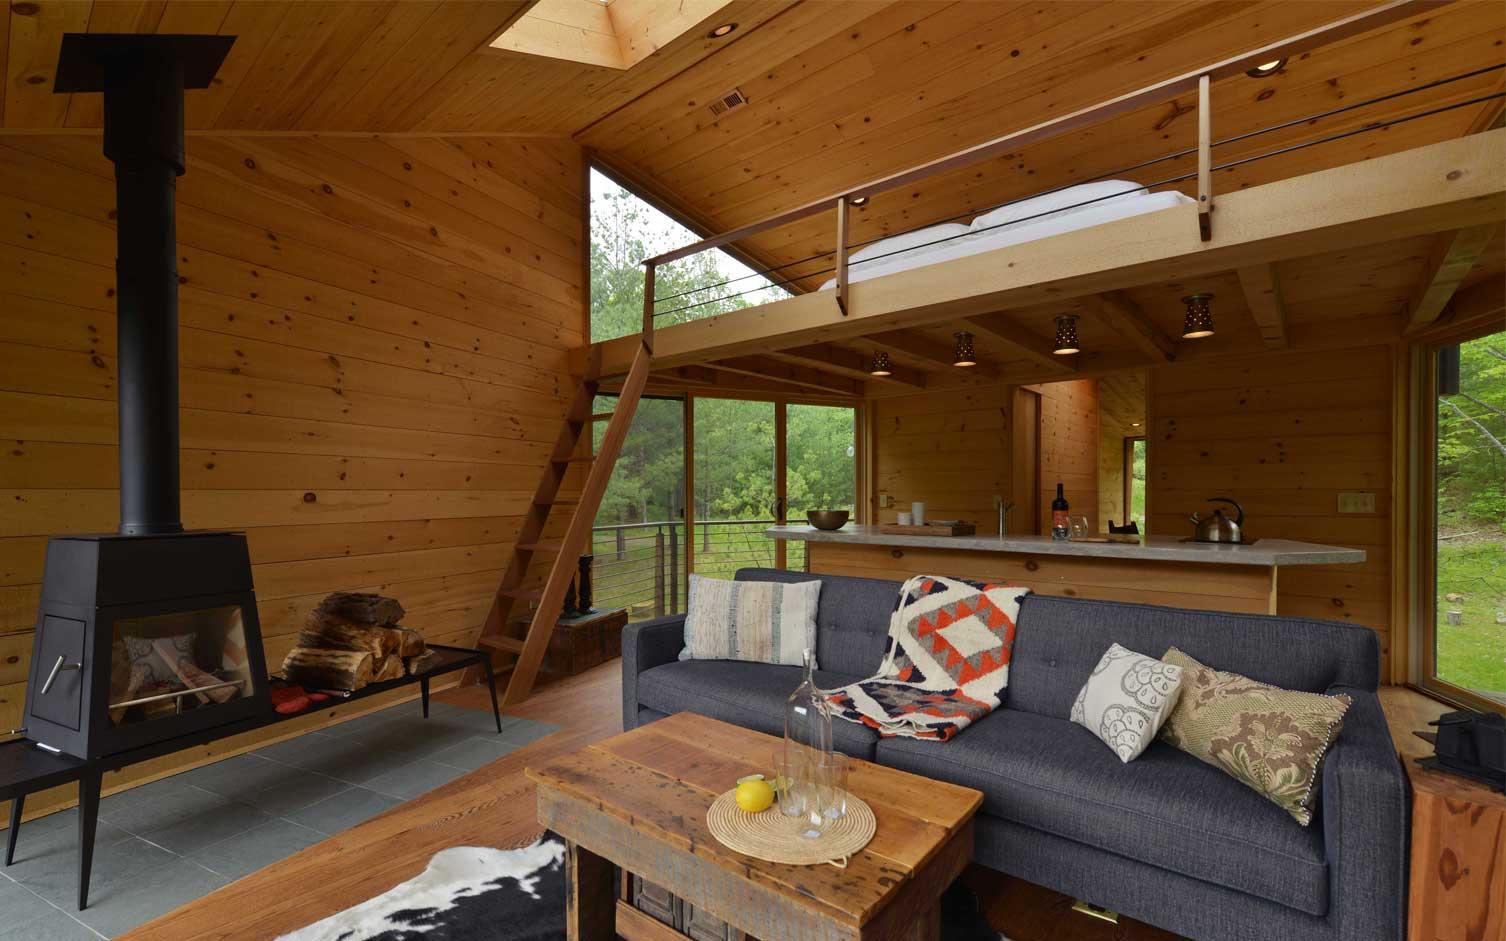 Inhabit Treehouse Antony Gibbon Designs Media Photos And Videos 8 Archello